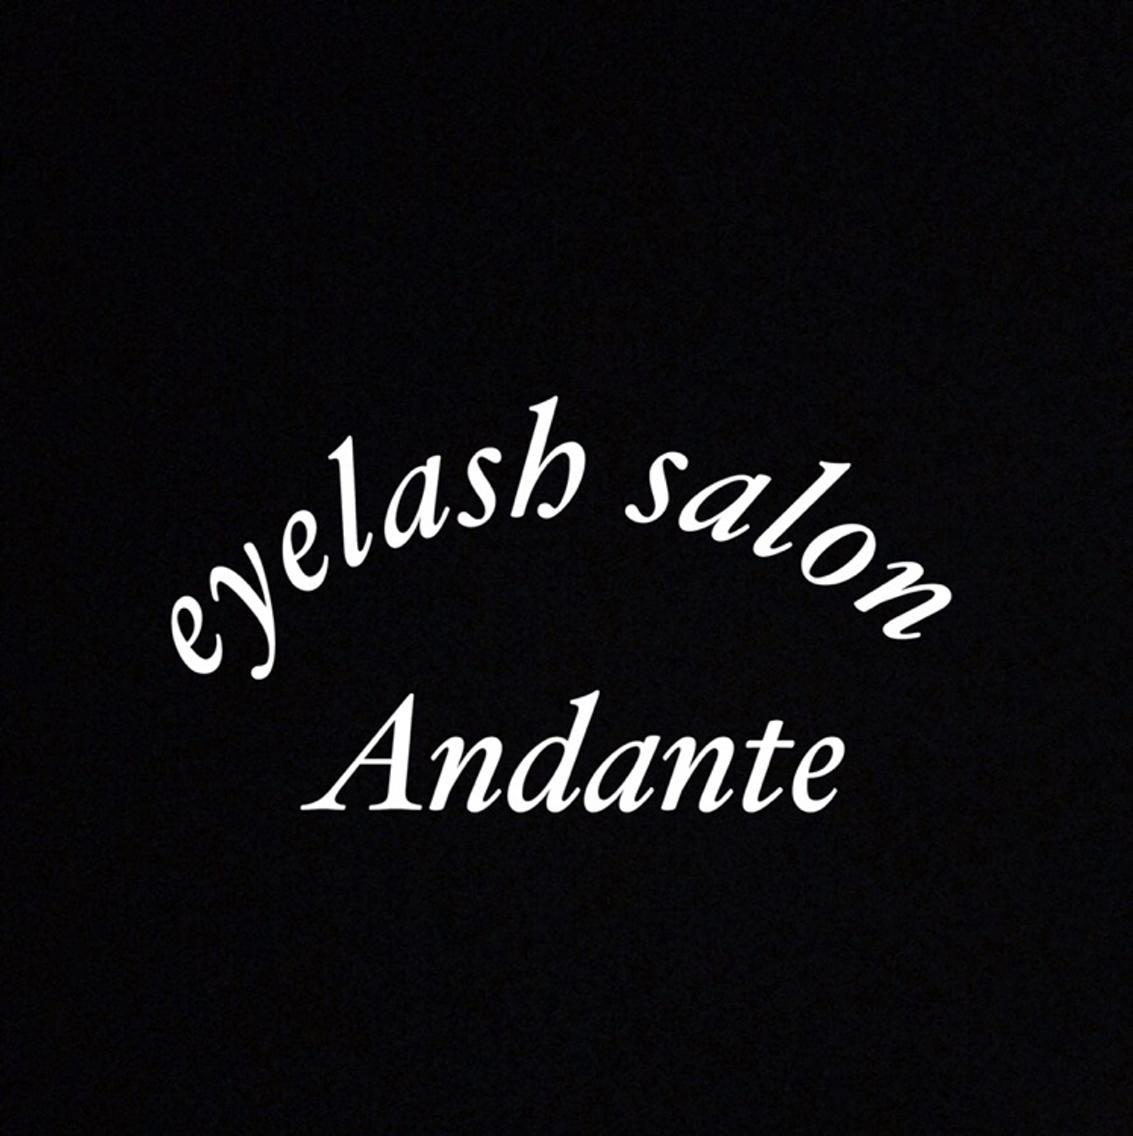 eyelash salon Andante所属・西村 梨恵の掲載